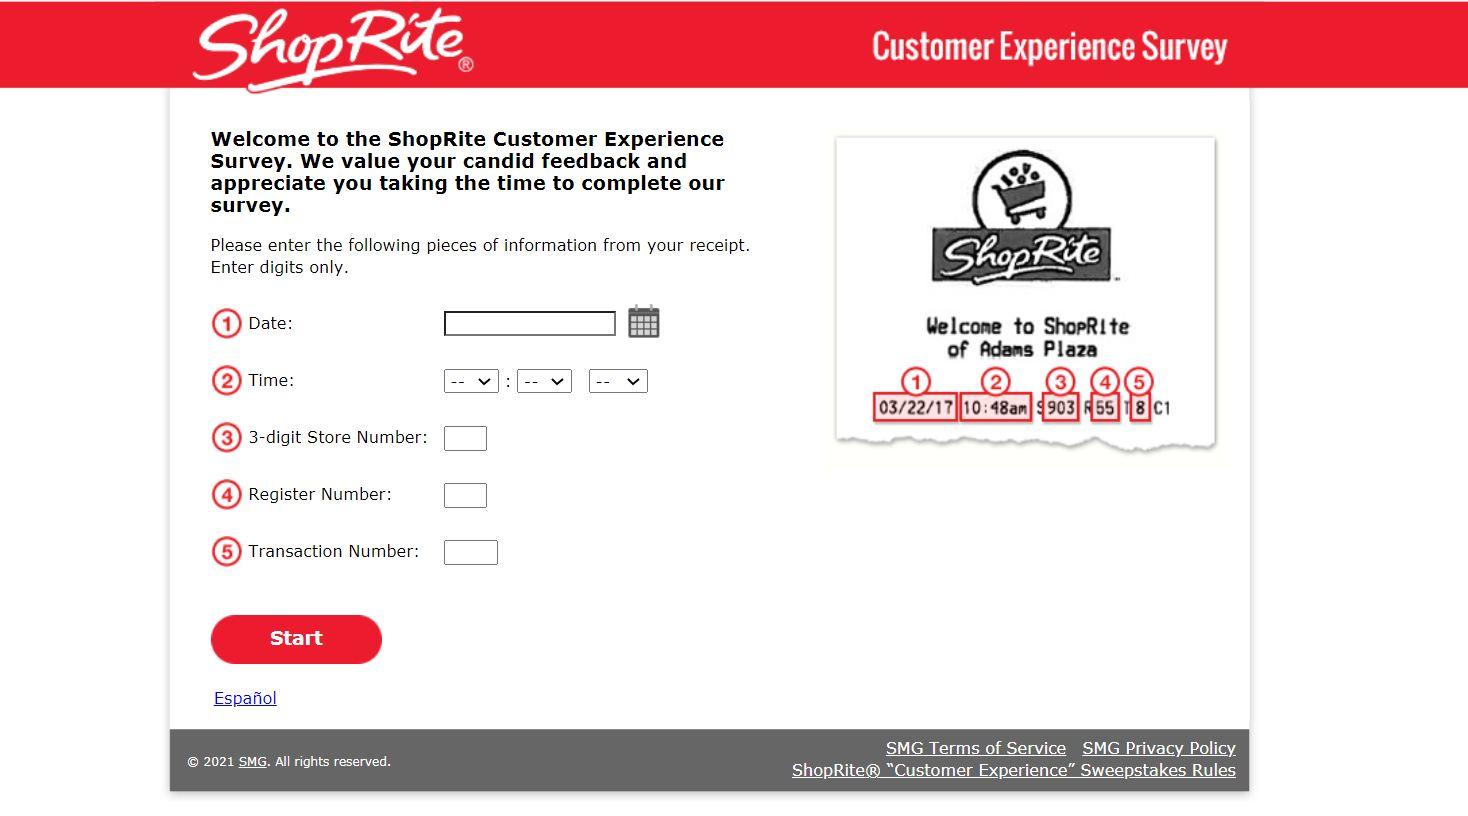 Myshopriteexperience.com - Win $500 Gift Card - Shop Rite Survey